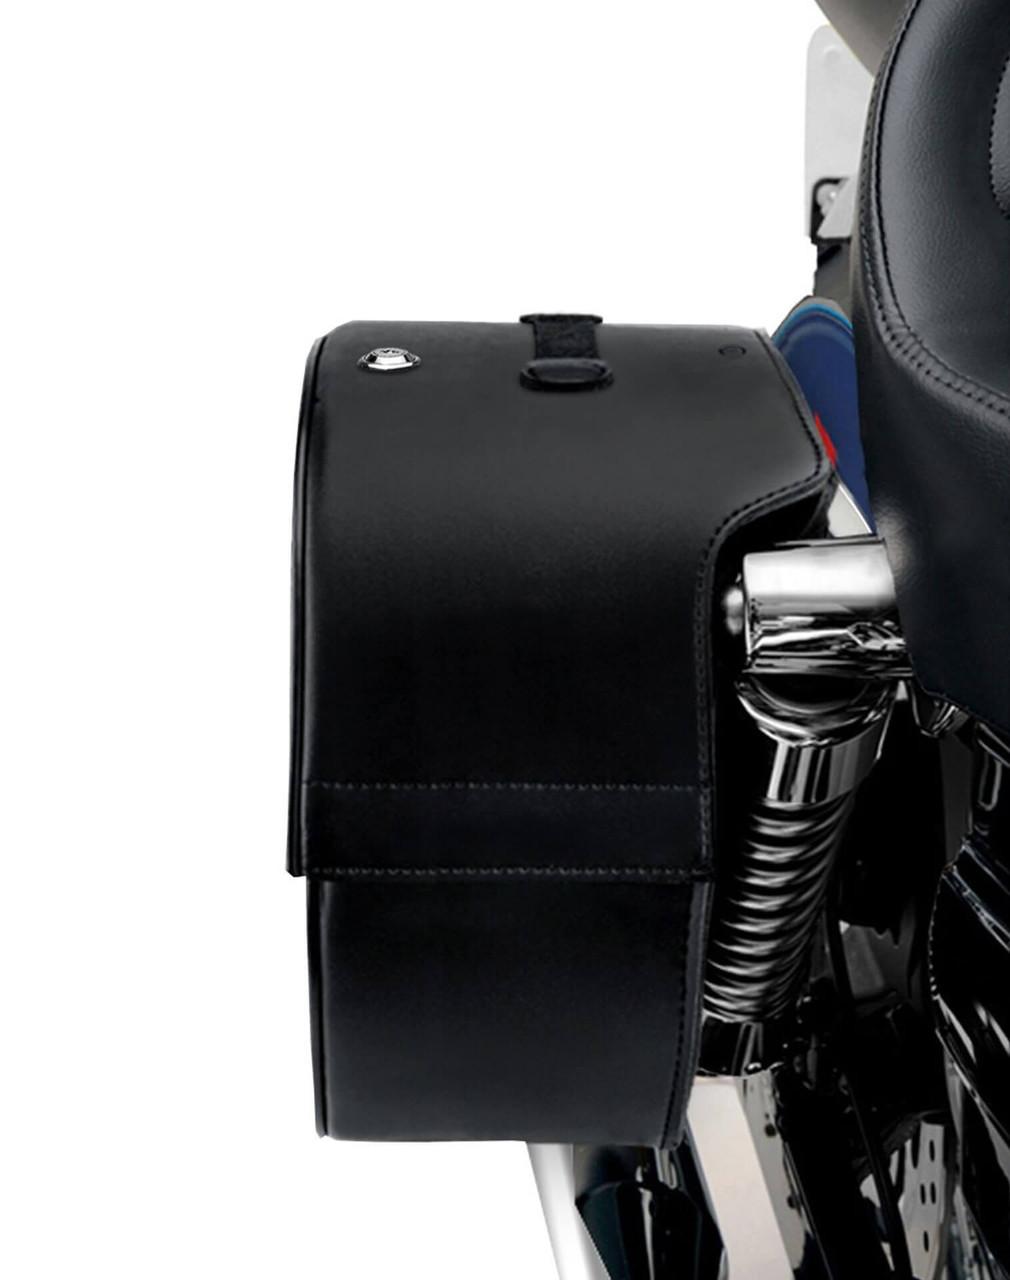 Kawasaki 1600 Mean Streak Char Studded With Shock Cutout Large Motorcycle Saddlebags Shock Cutout View